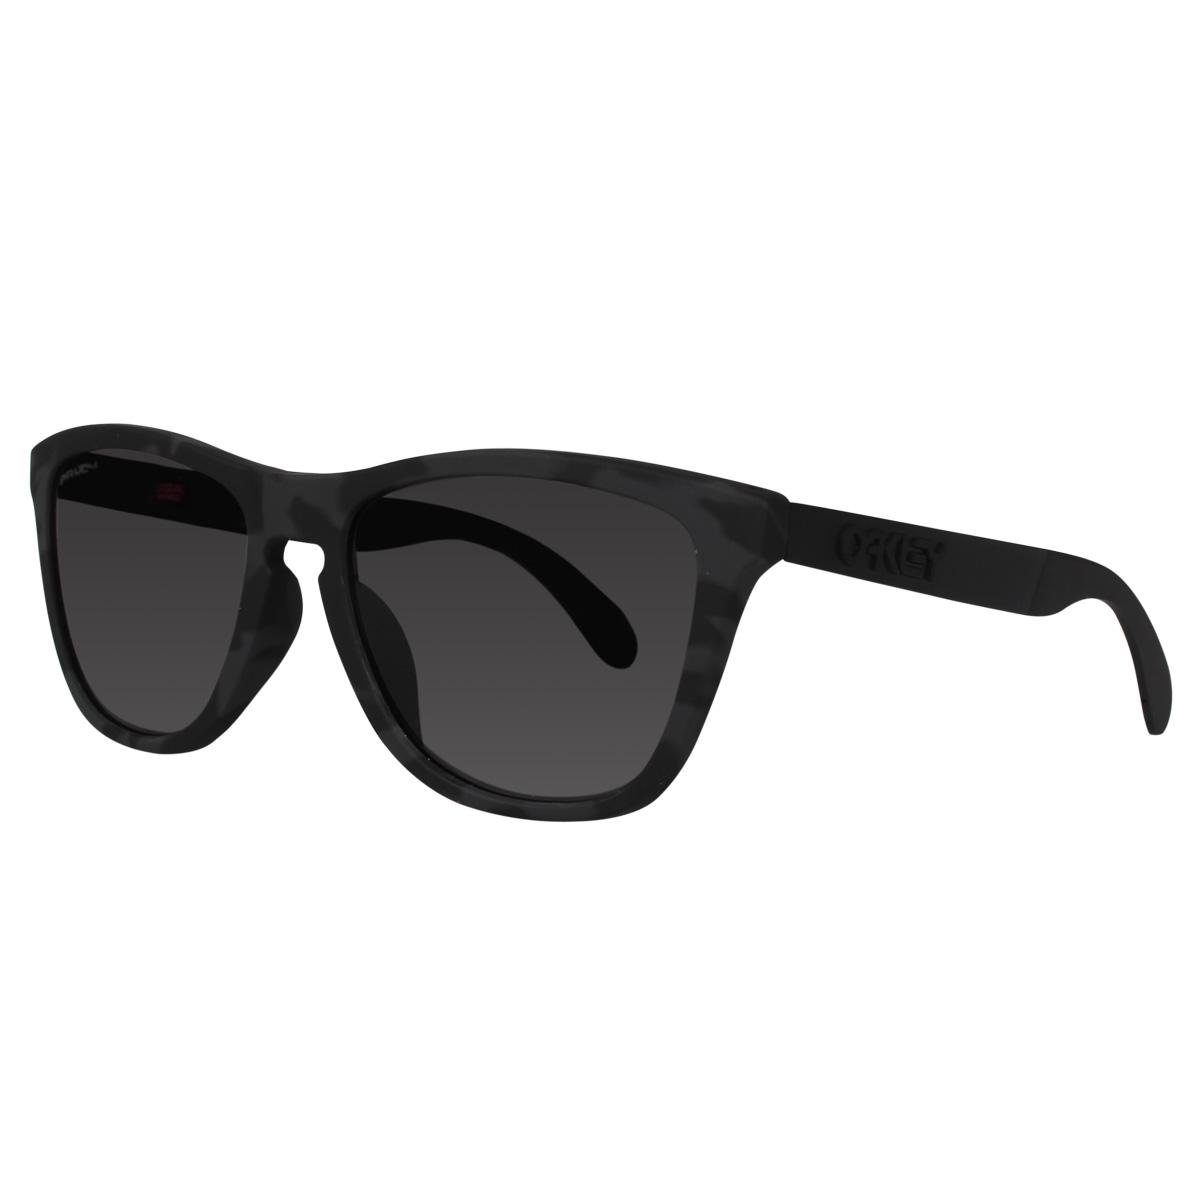 Oakley FROGSKINS MIX ASIA FIT オークリー サングラス フロッグスキン ミックス アジアンフィット メンズ レディース ブラック 黒 0OO9428F